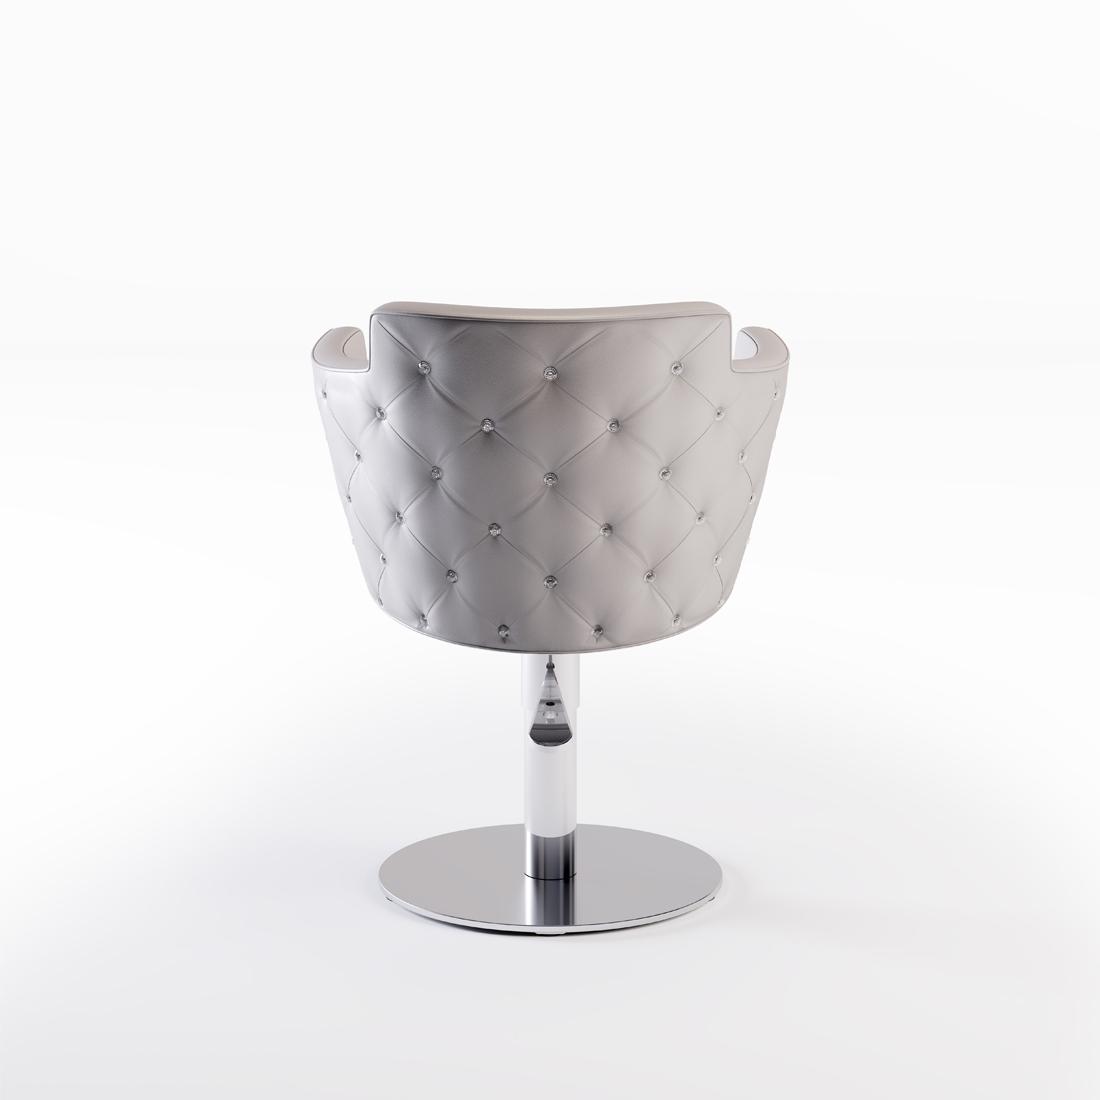 CINDARELLA – Mademoiselle chair – Back Swarovski